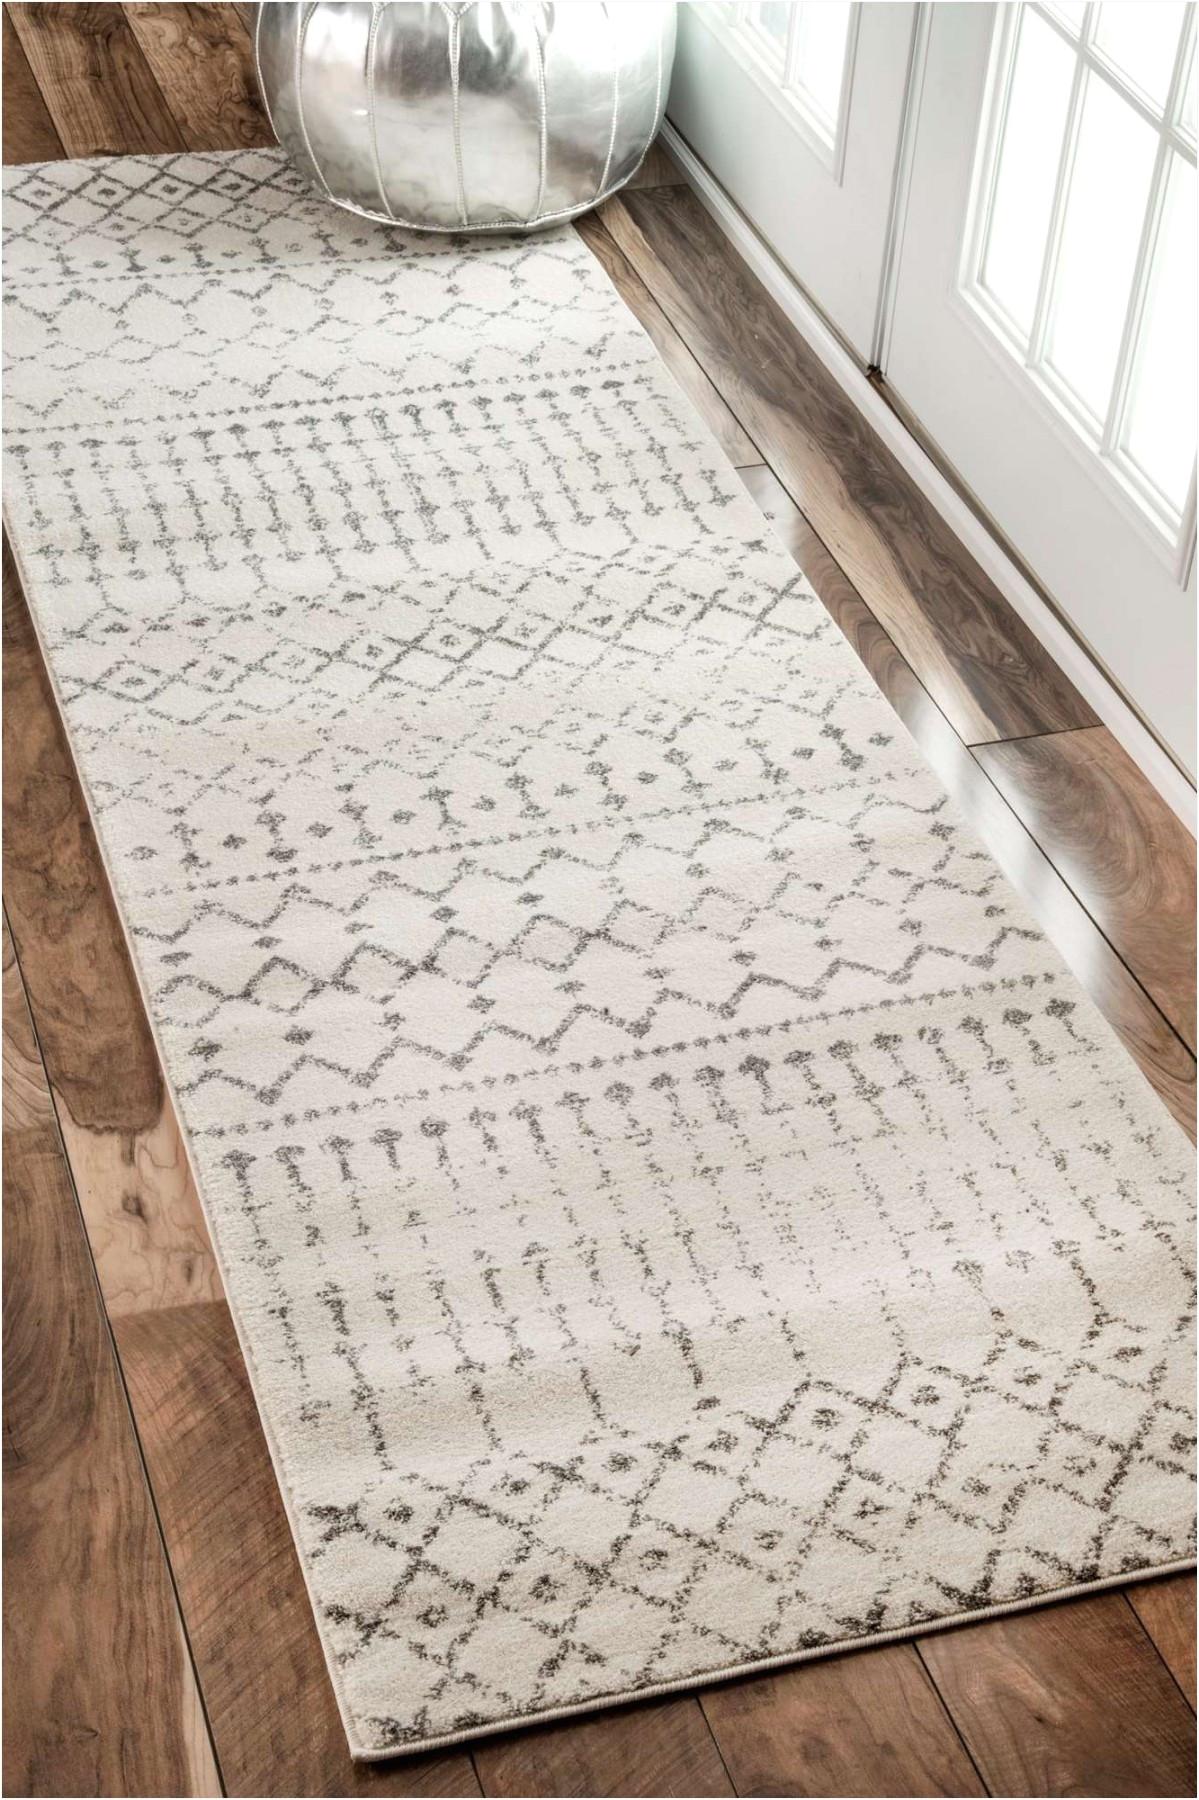 round area rugs kohl s best of elegant moroccan trellis area rug pics